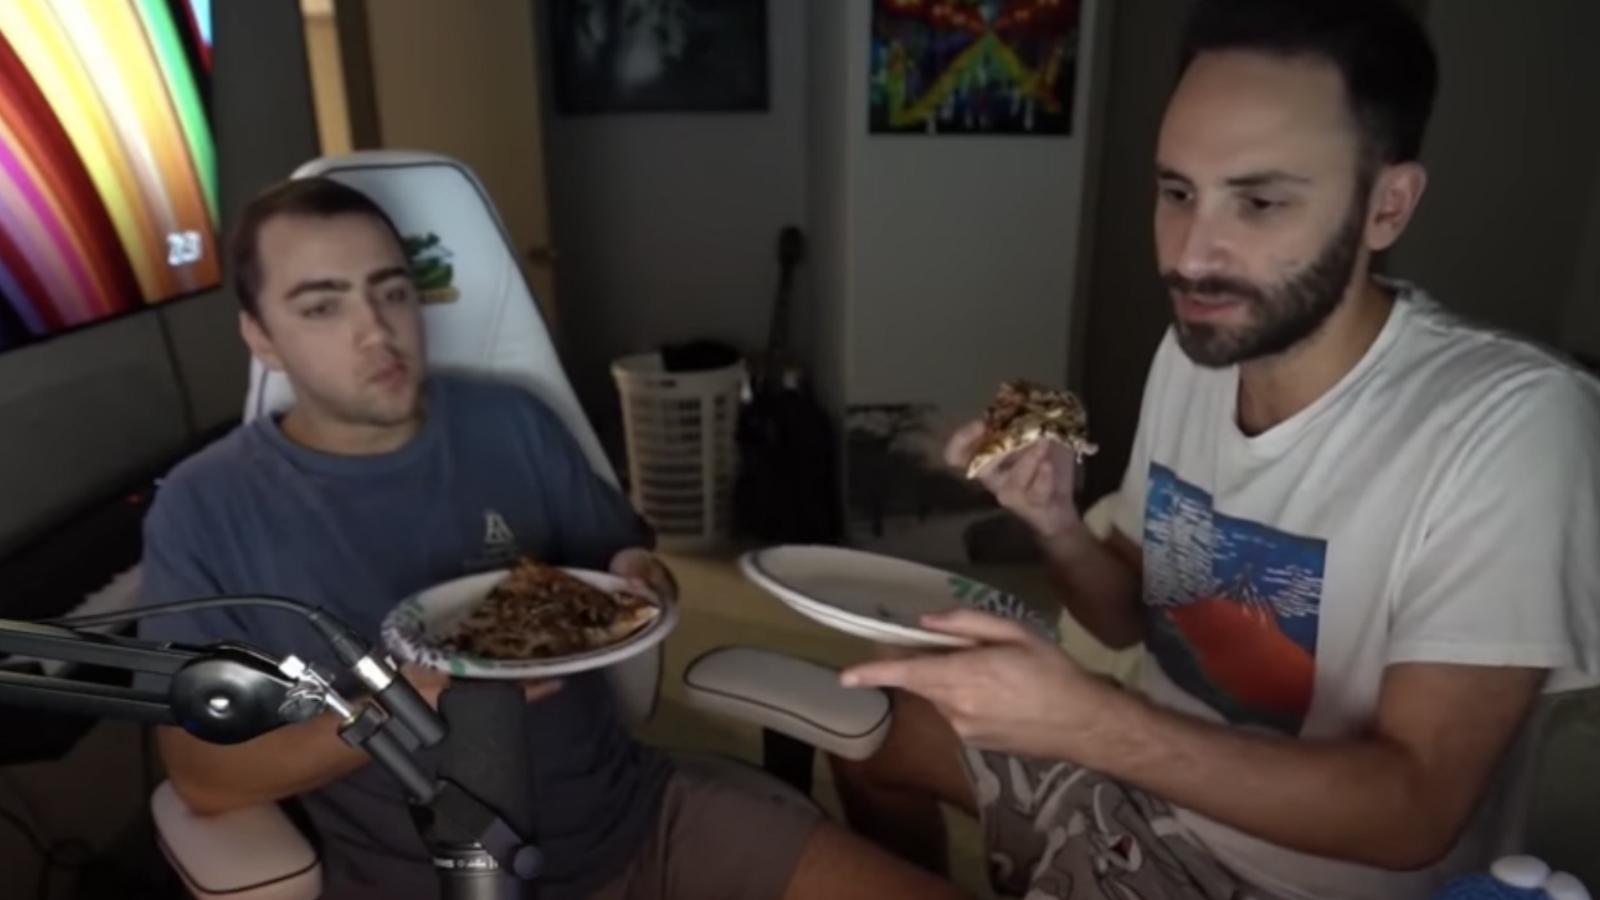 streamers Mizkif and Reckful eating pizza on stream